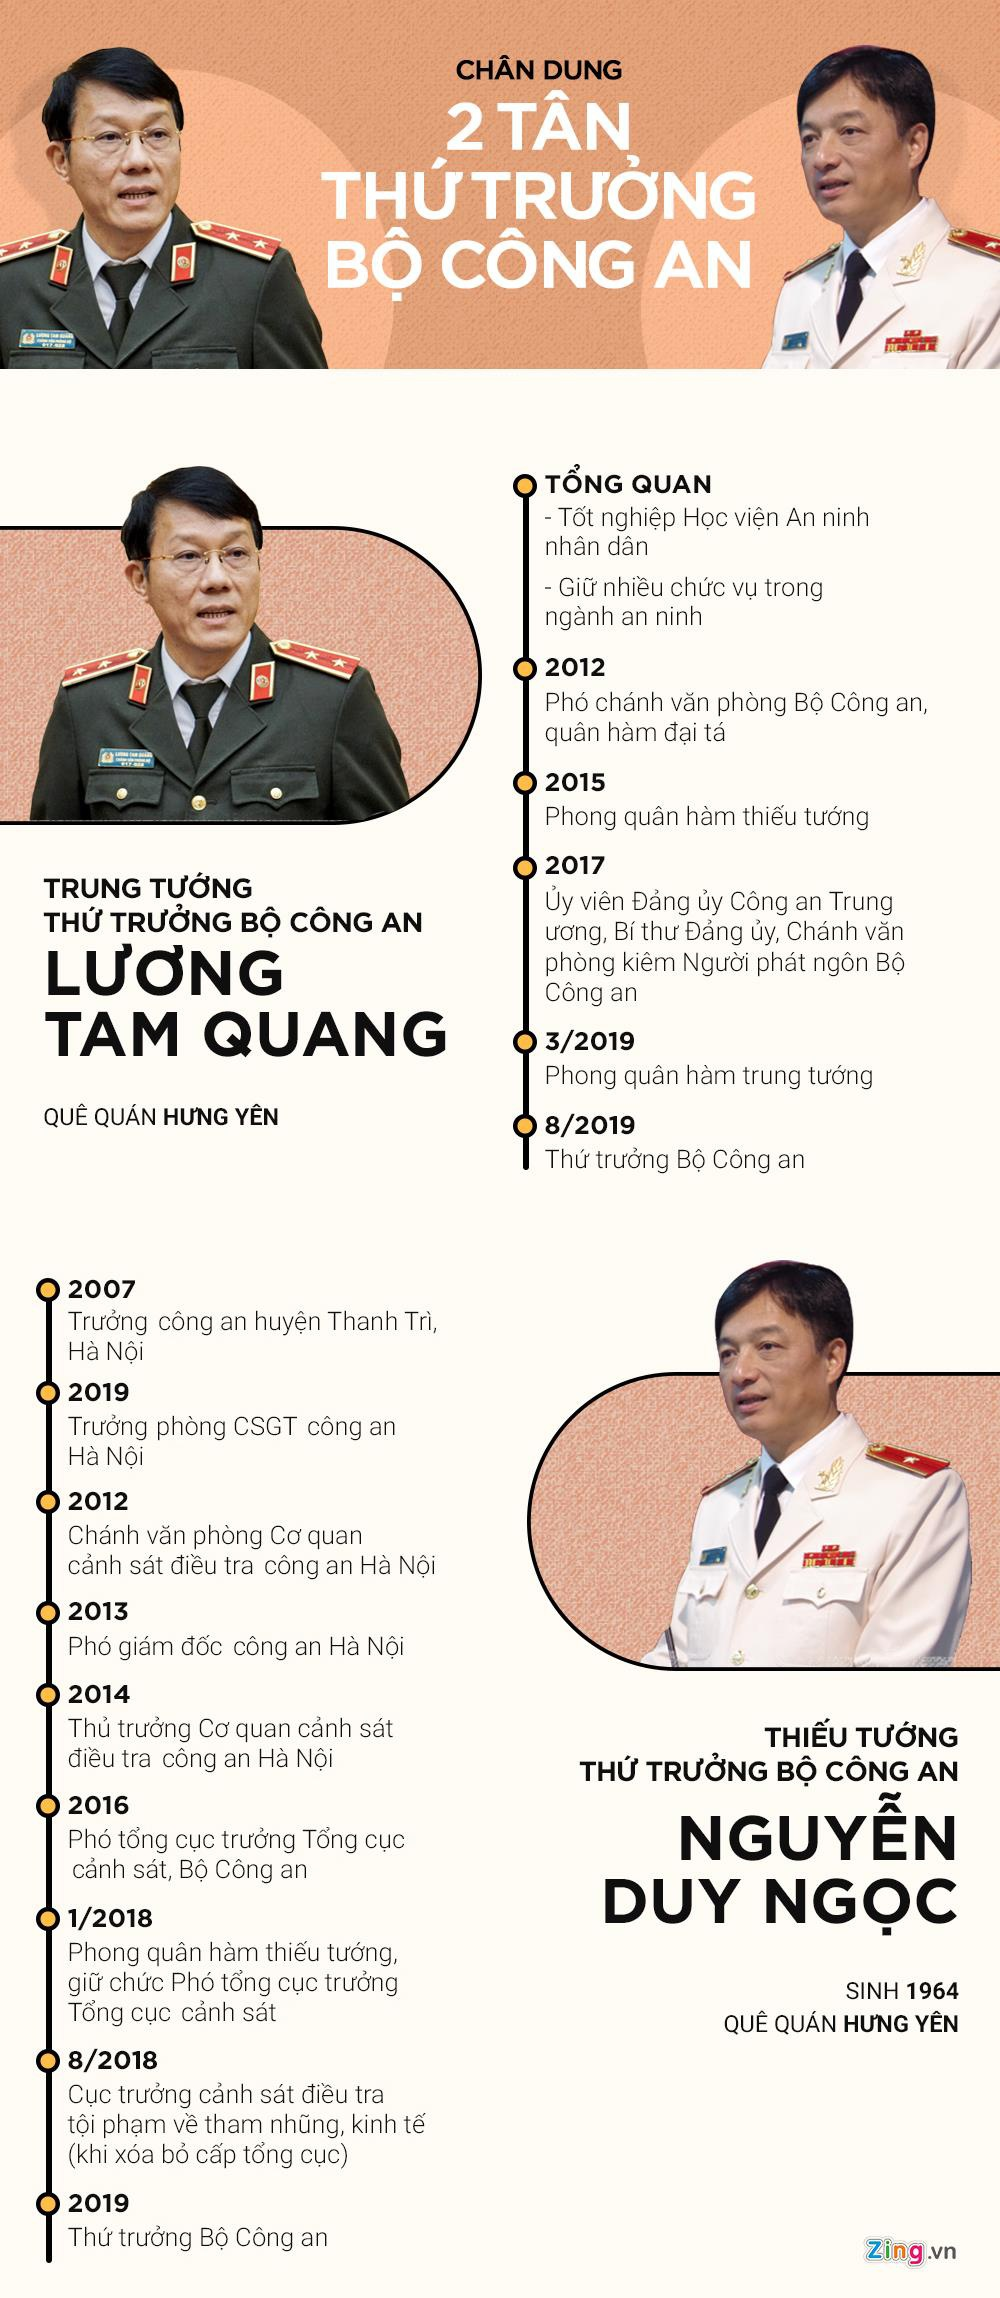 Chan dung 2 tan thu truong Bo Cong an hinh anh 1